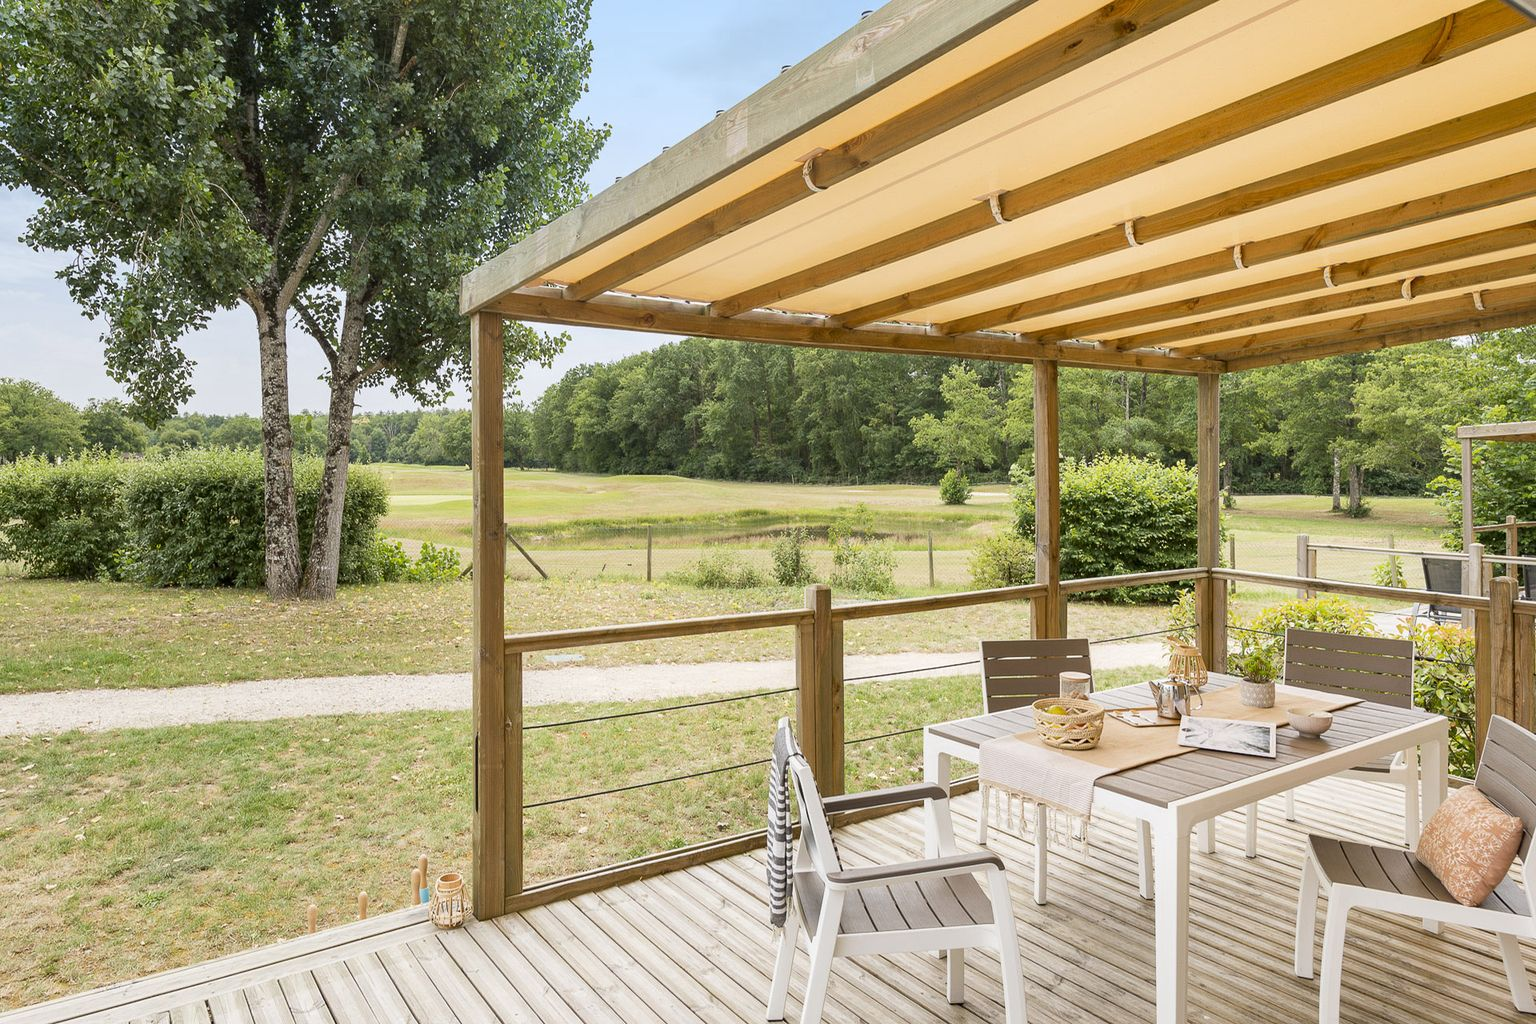 Location - Cottage Key West Family 3 Chambres - 2 Salles De Bain - Climatisation Premium - Camping Sandaya Les Alicourts